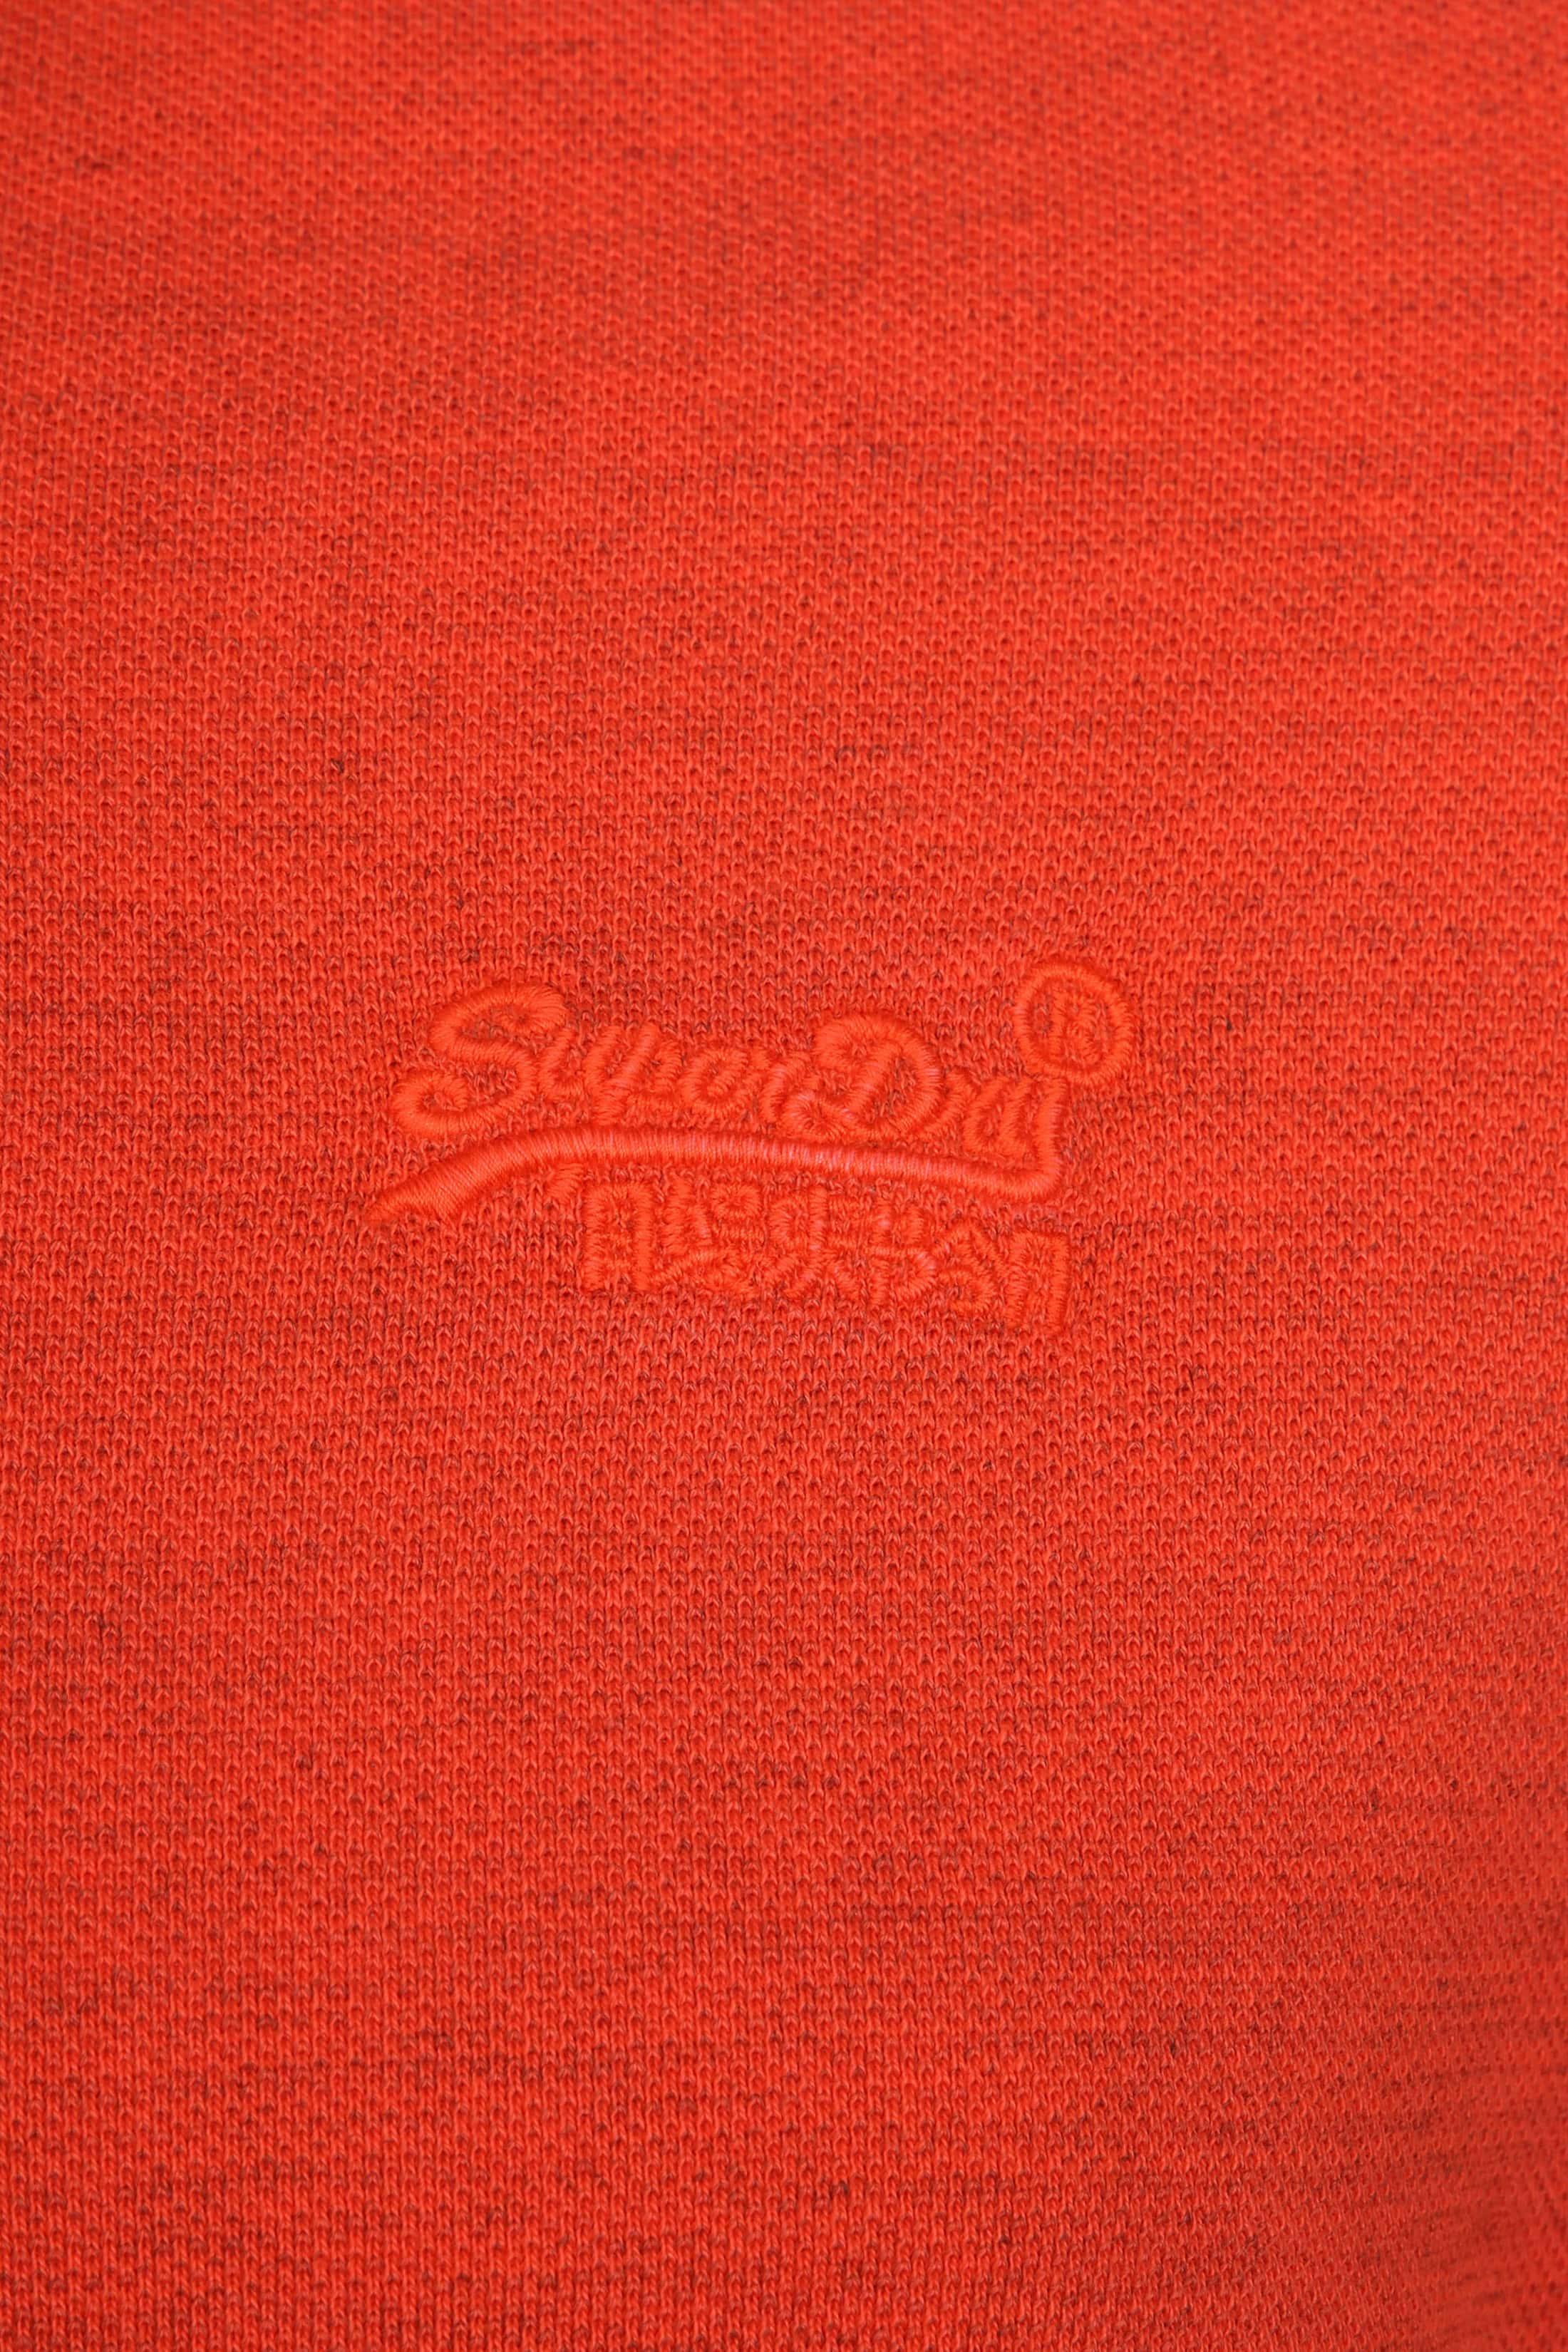 Superdry Premium Poloshirt Orange foto 1